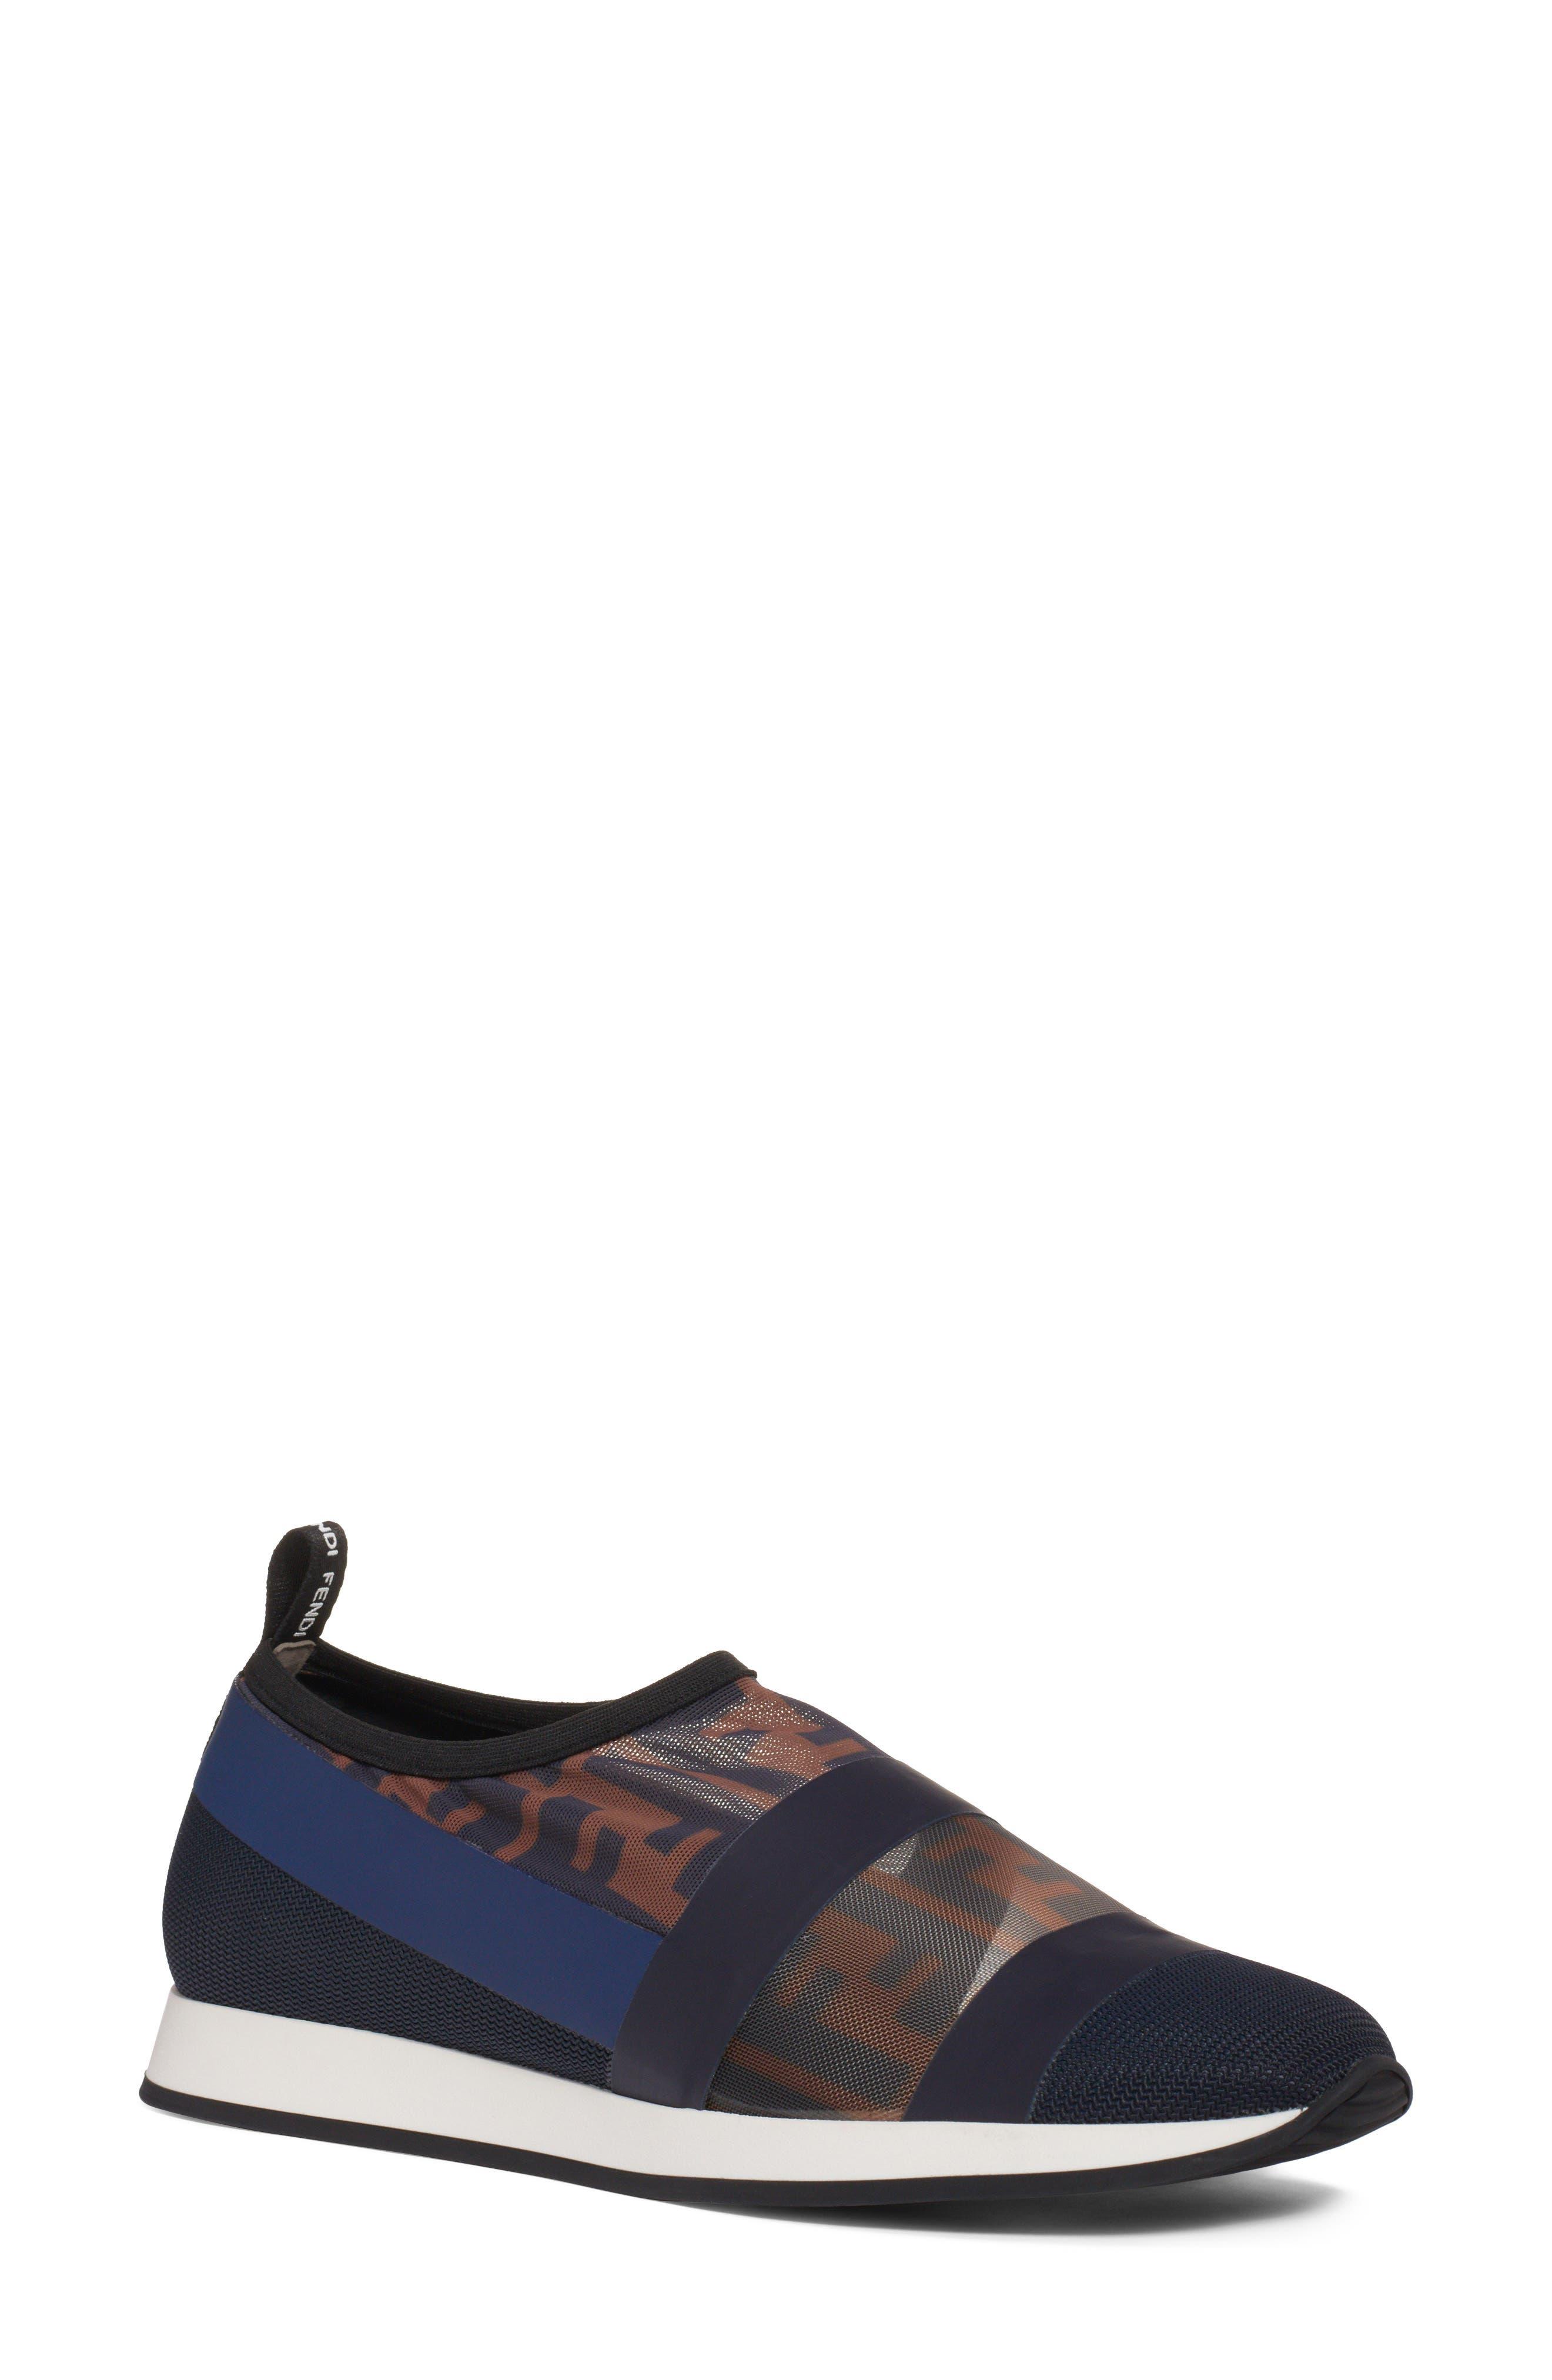 be2e22617619 Fendi Women s Shoes